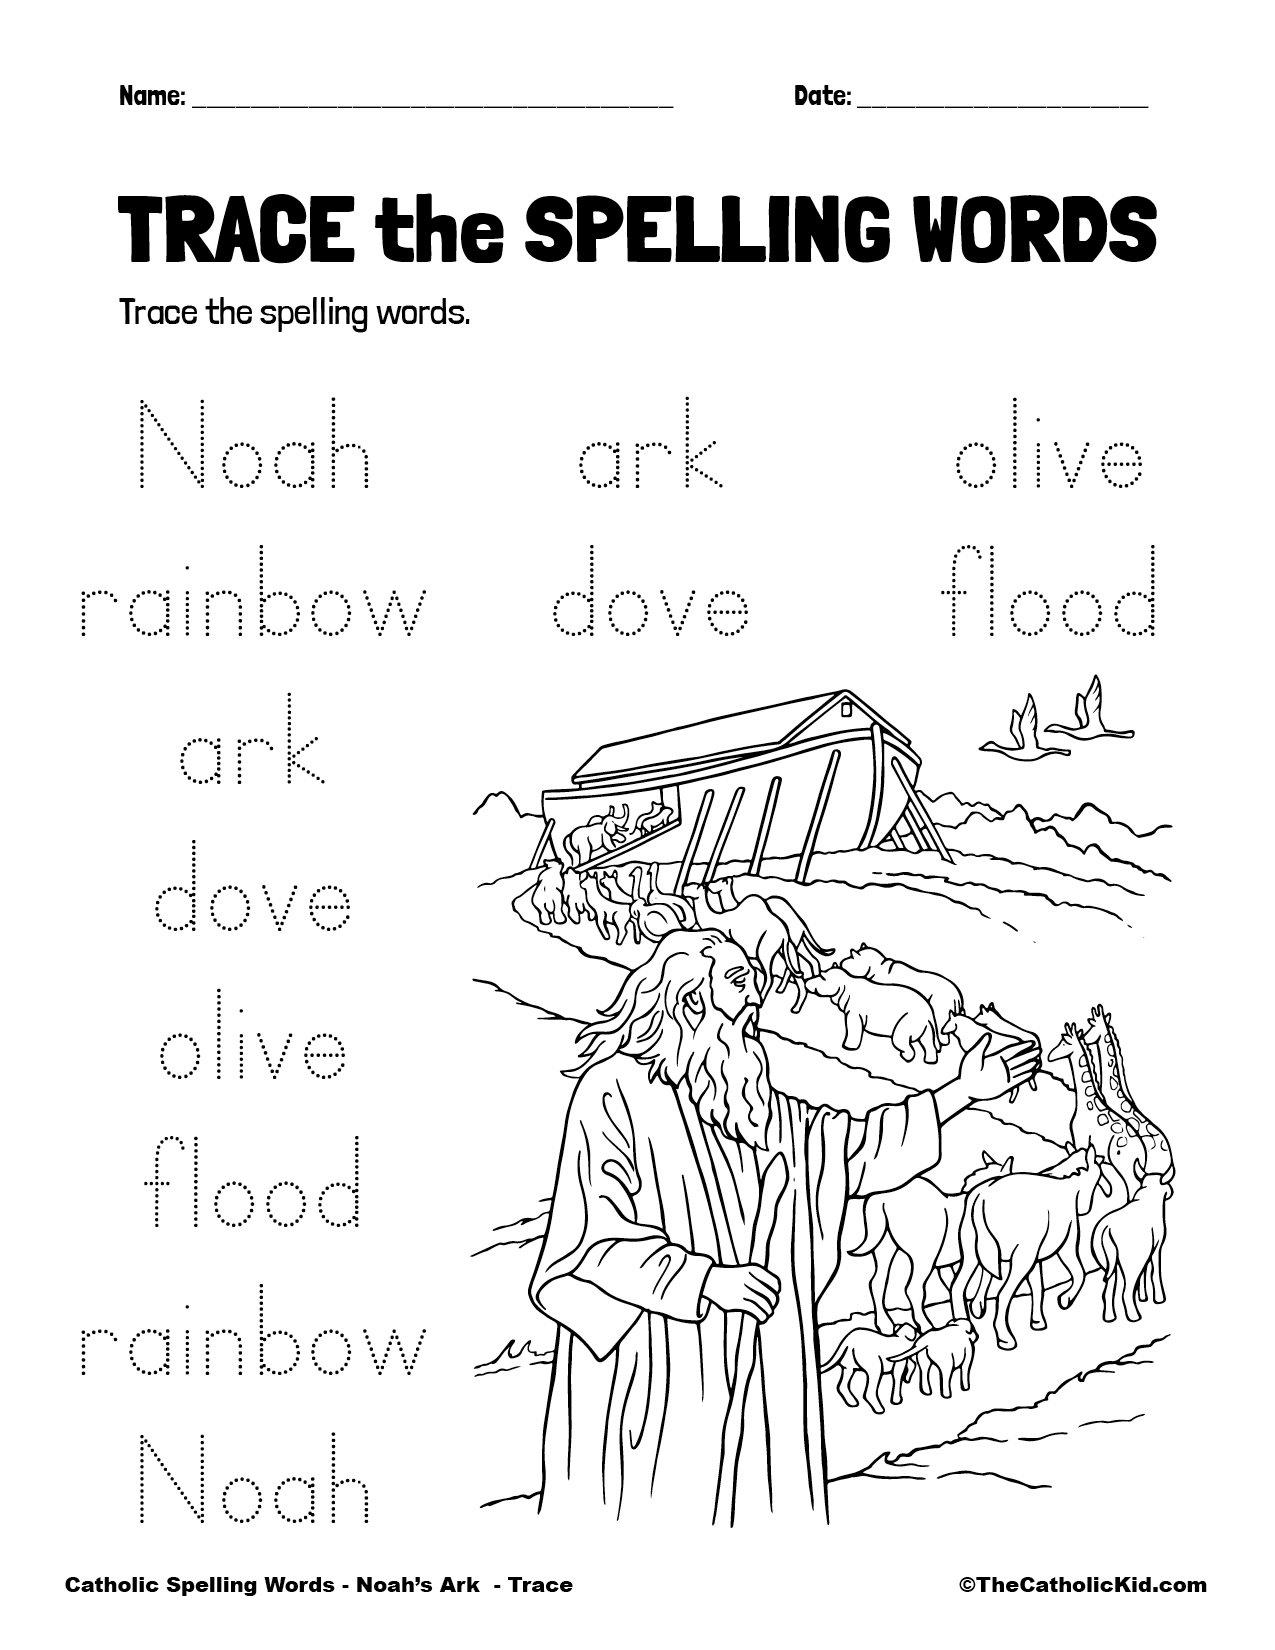 Catholic Spelling & Vocabulary Words Noah's Ark Worksheet 2 Trace